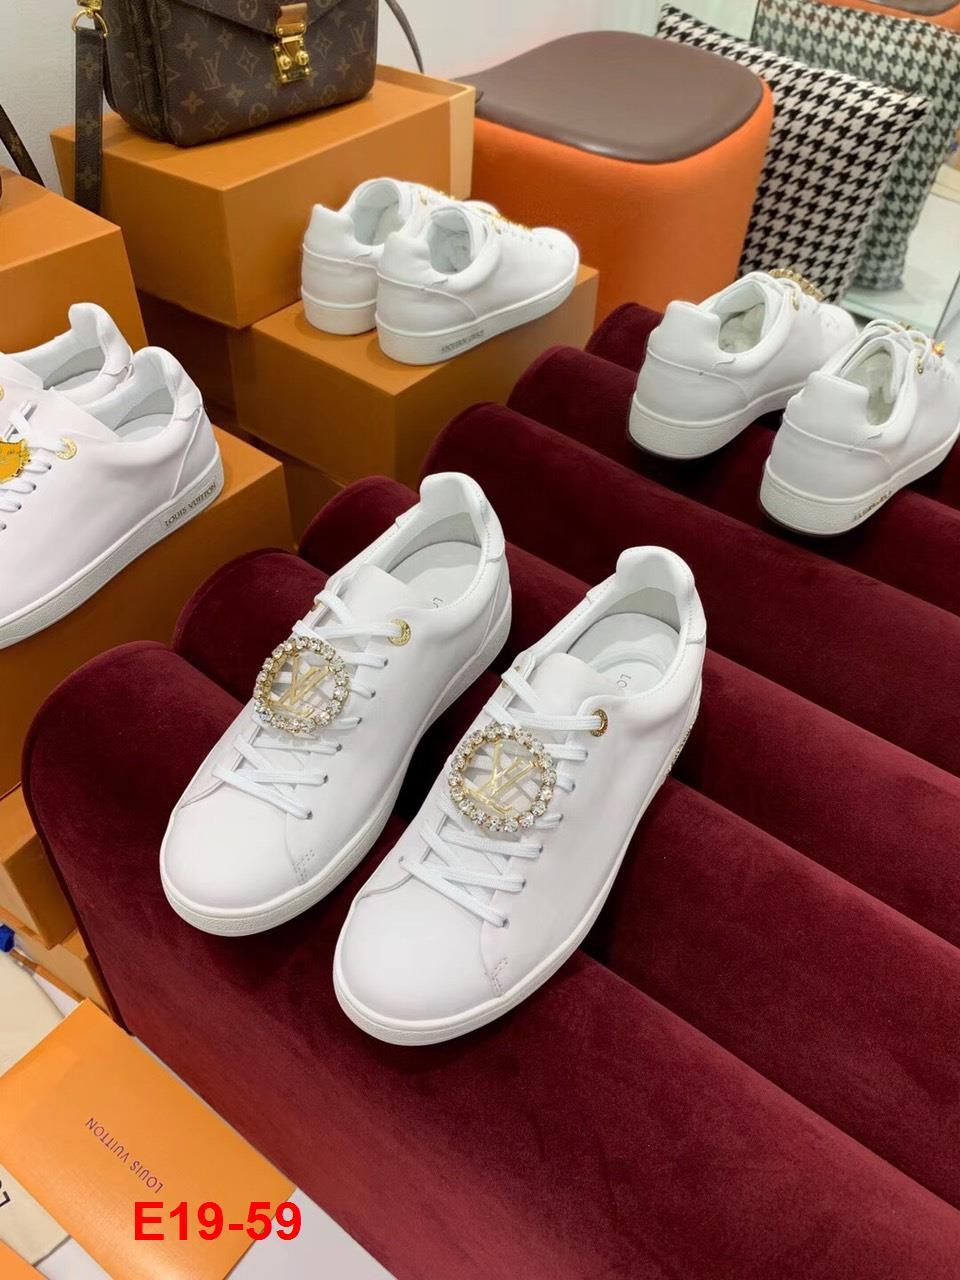 E19-59 Louis Vuitton giày thể thao siêu cấp